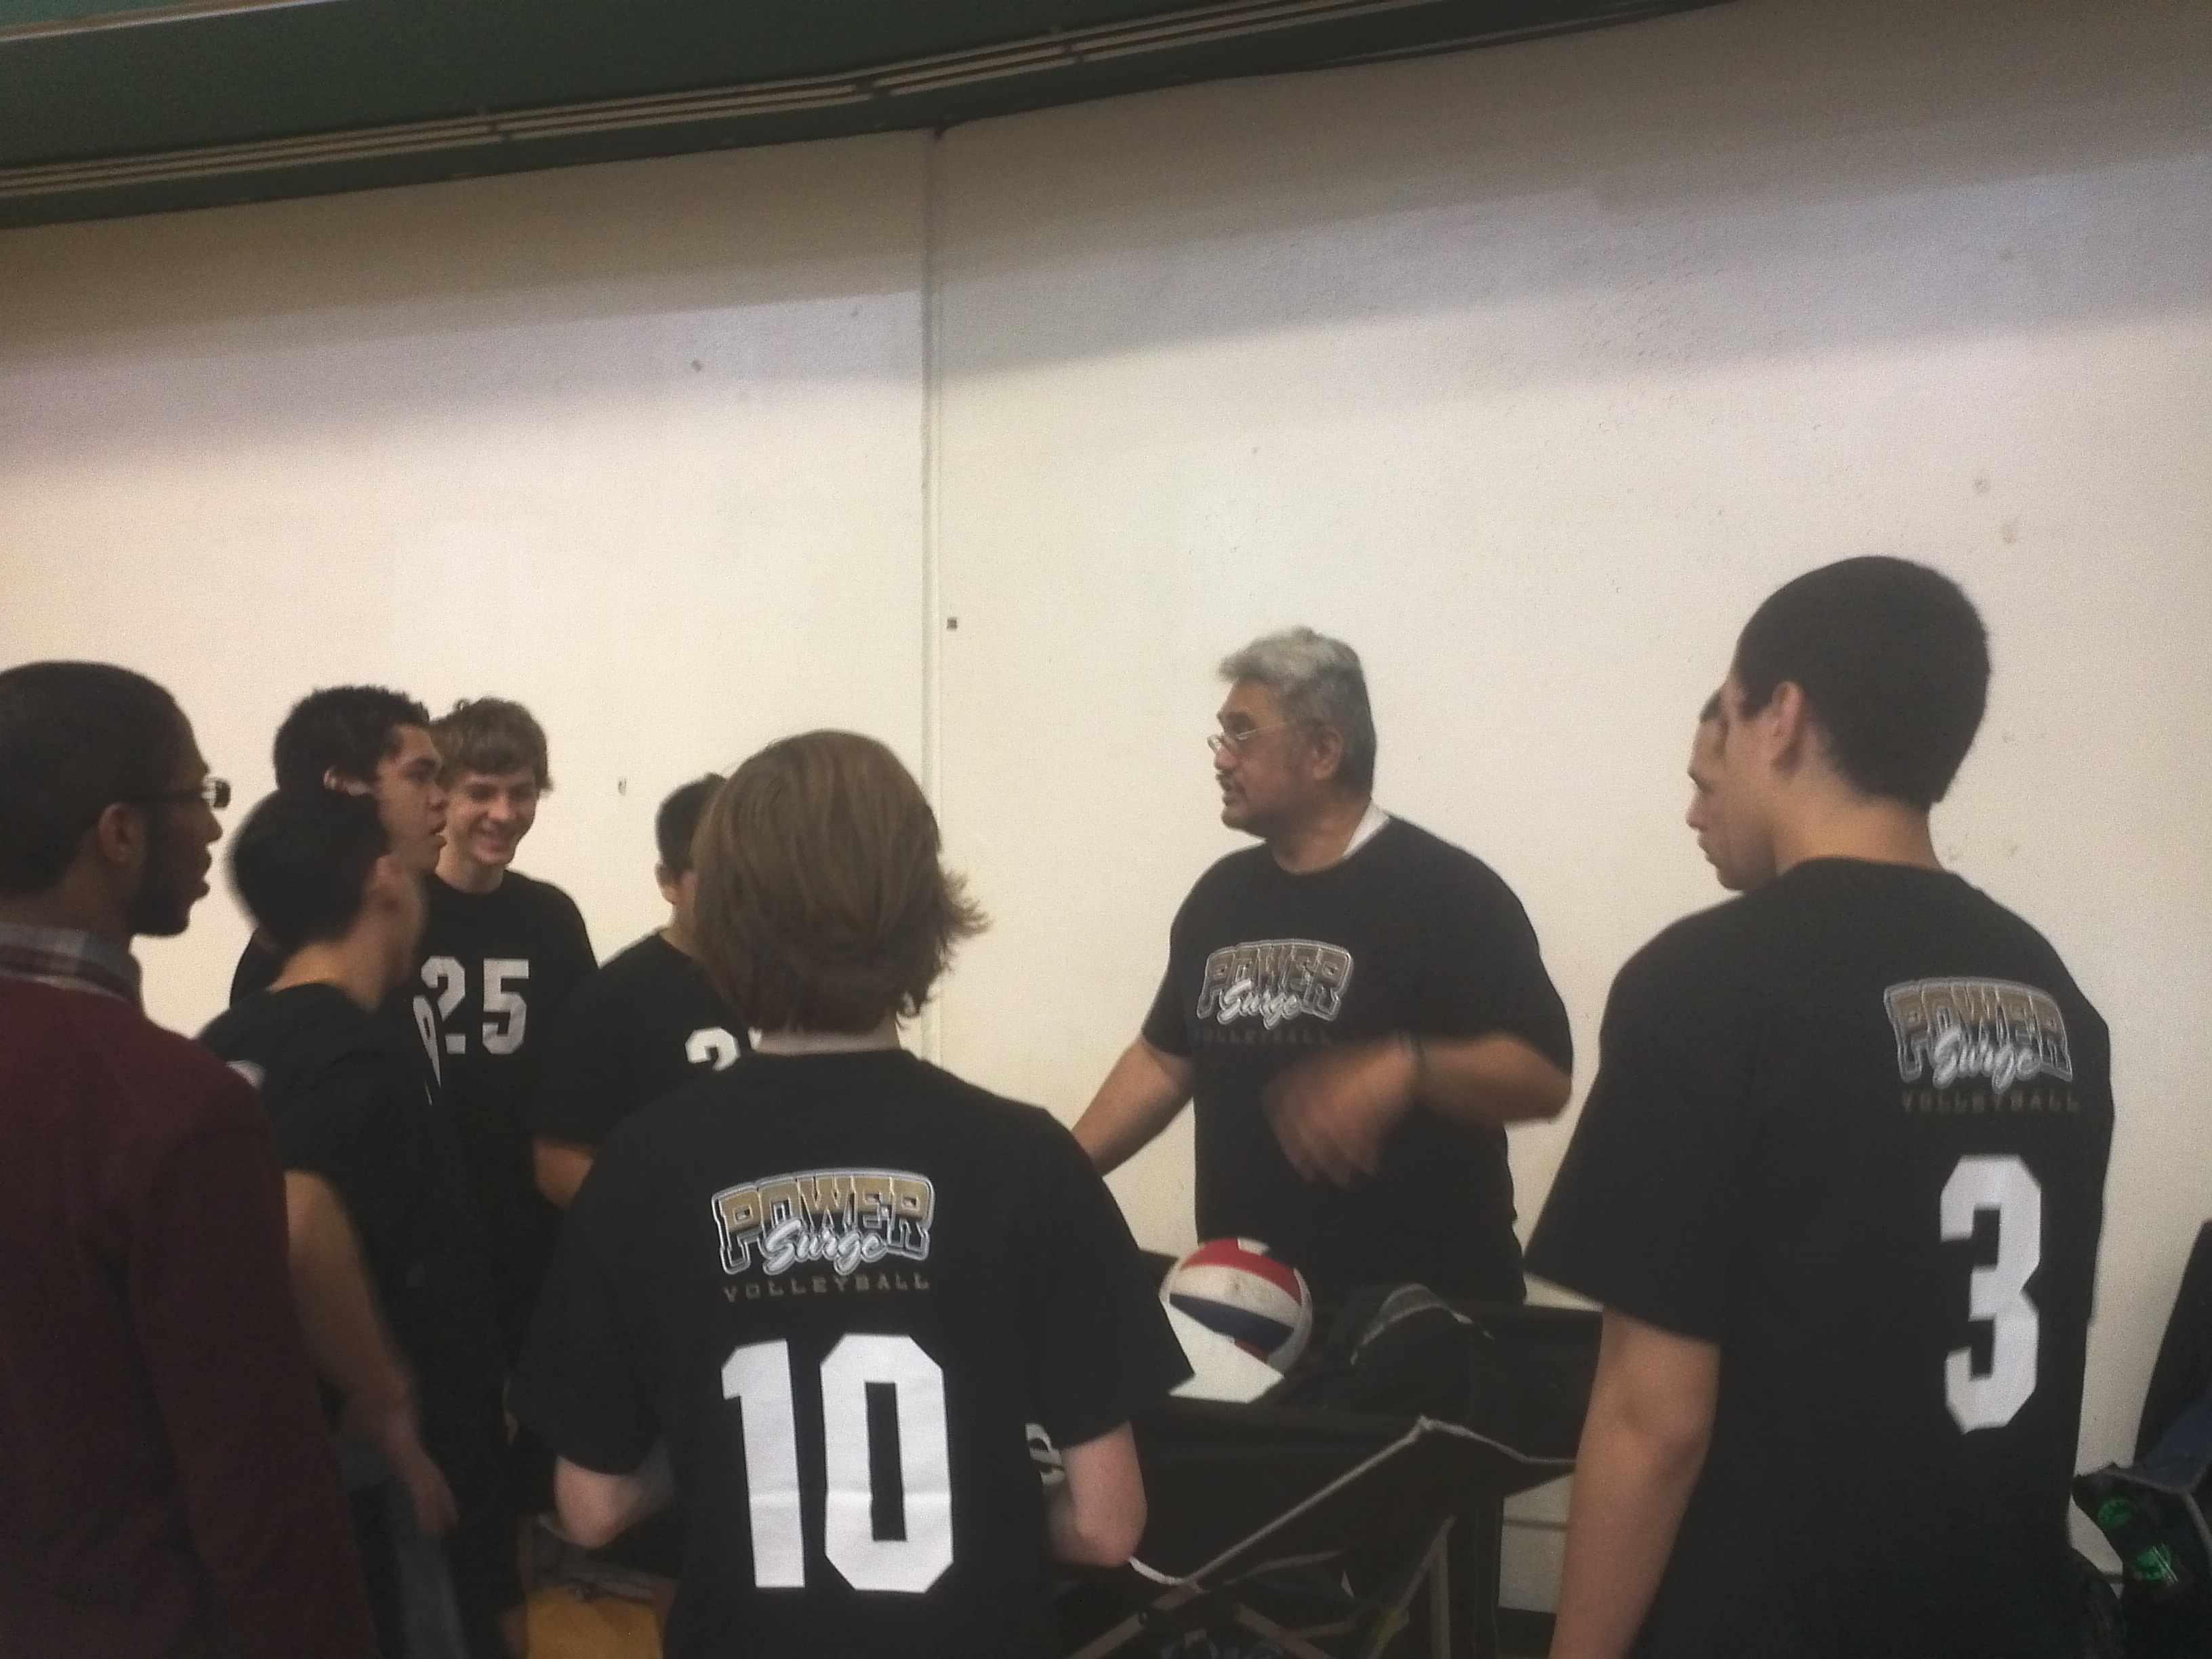 18 Boys at Highline 2.23.13